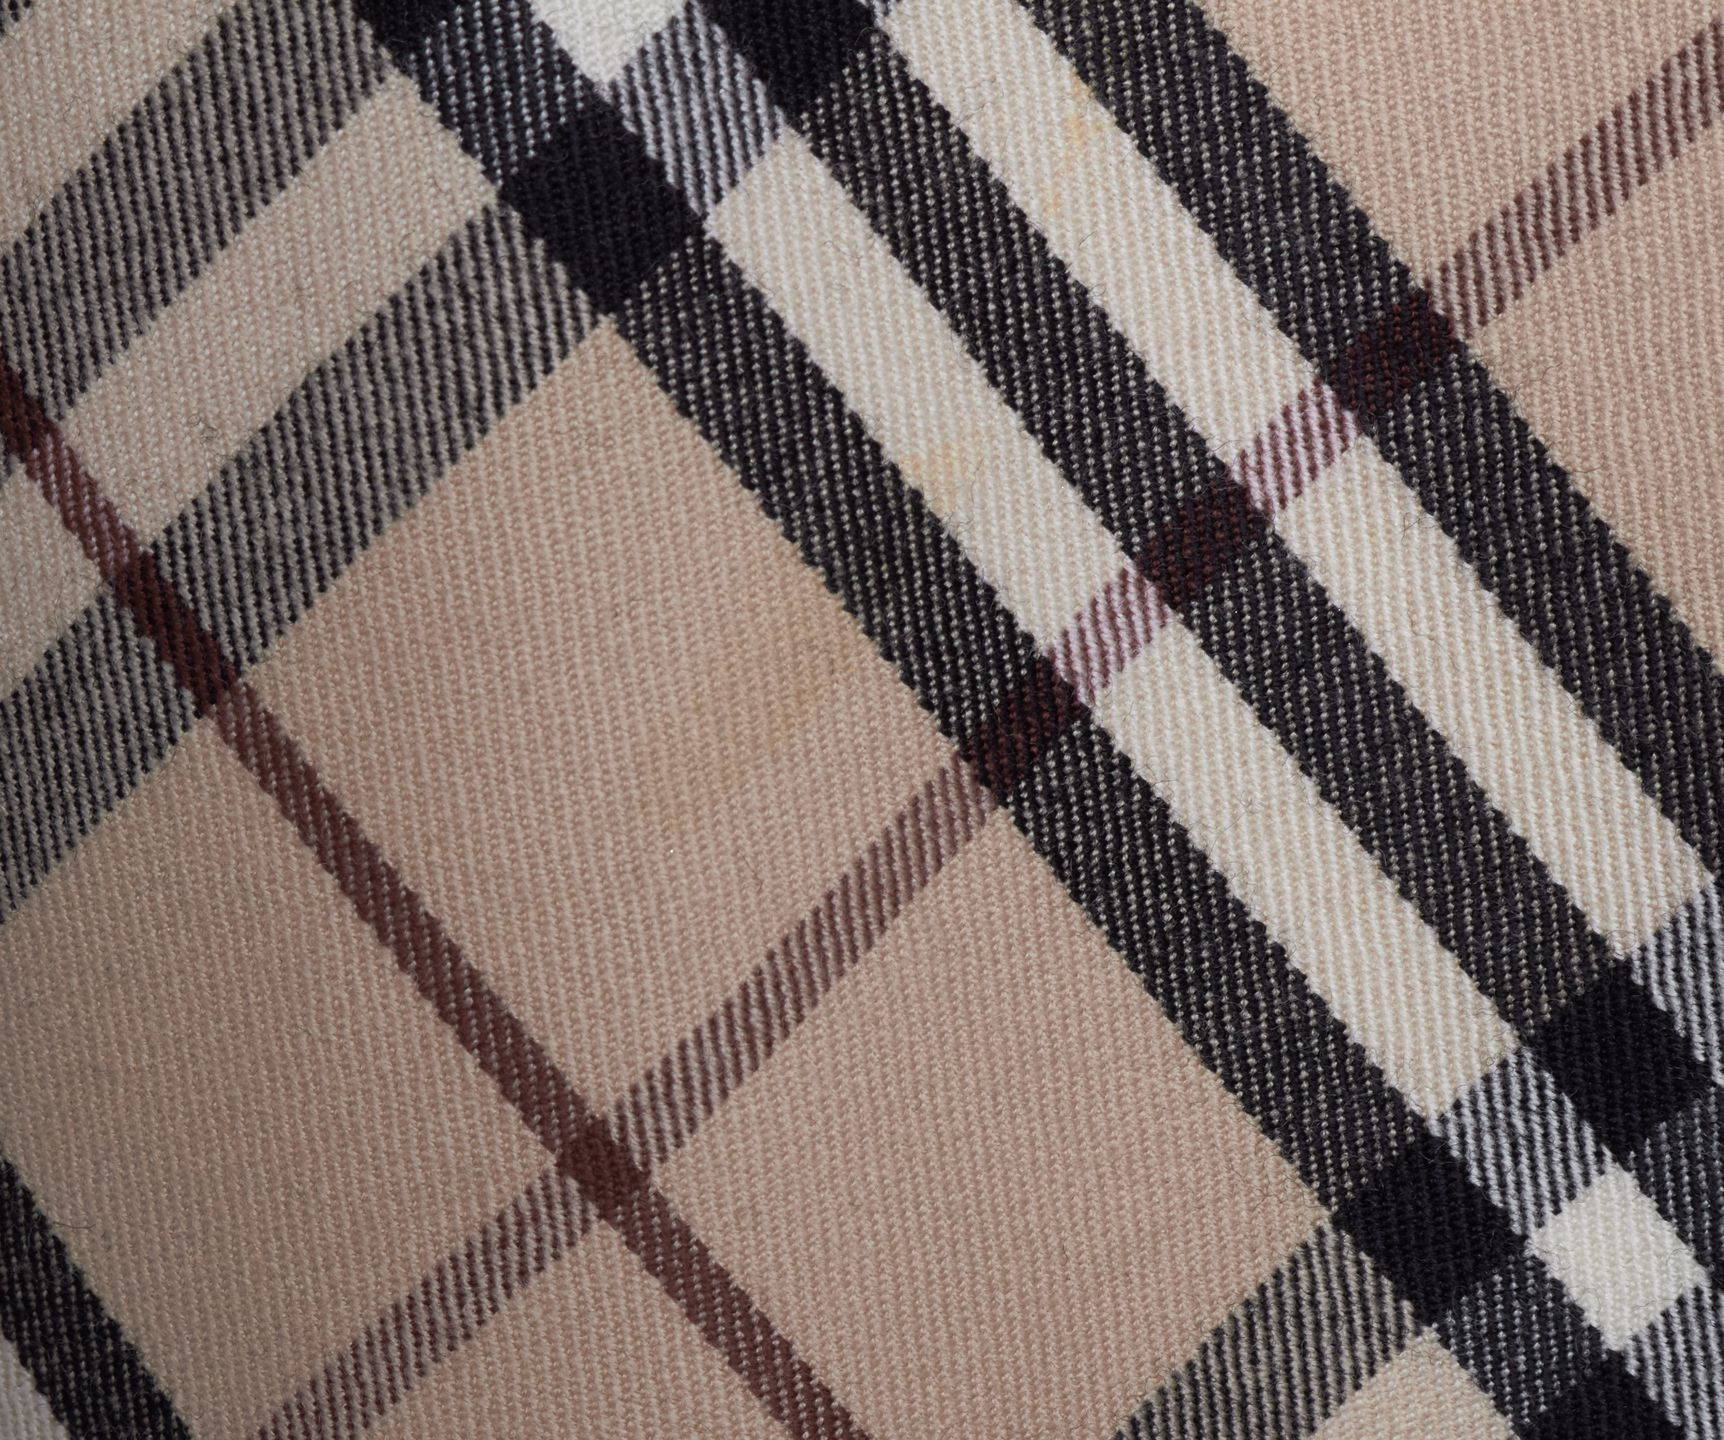 BURBERRY LONDON Beige Plaid Check Wool A-Line Skirt